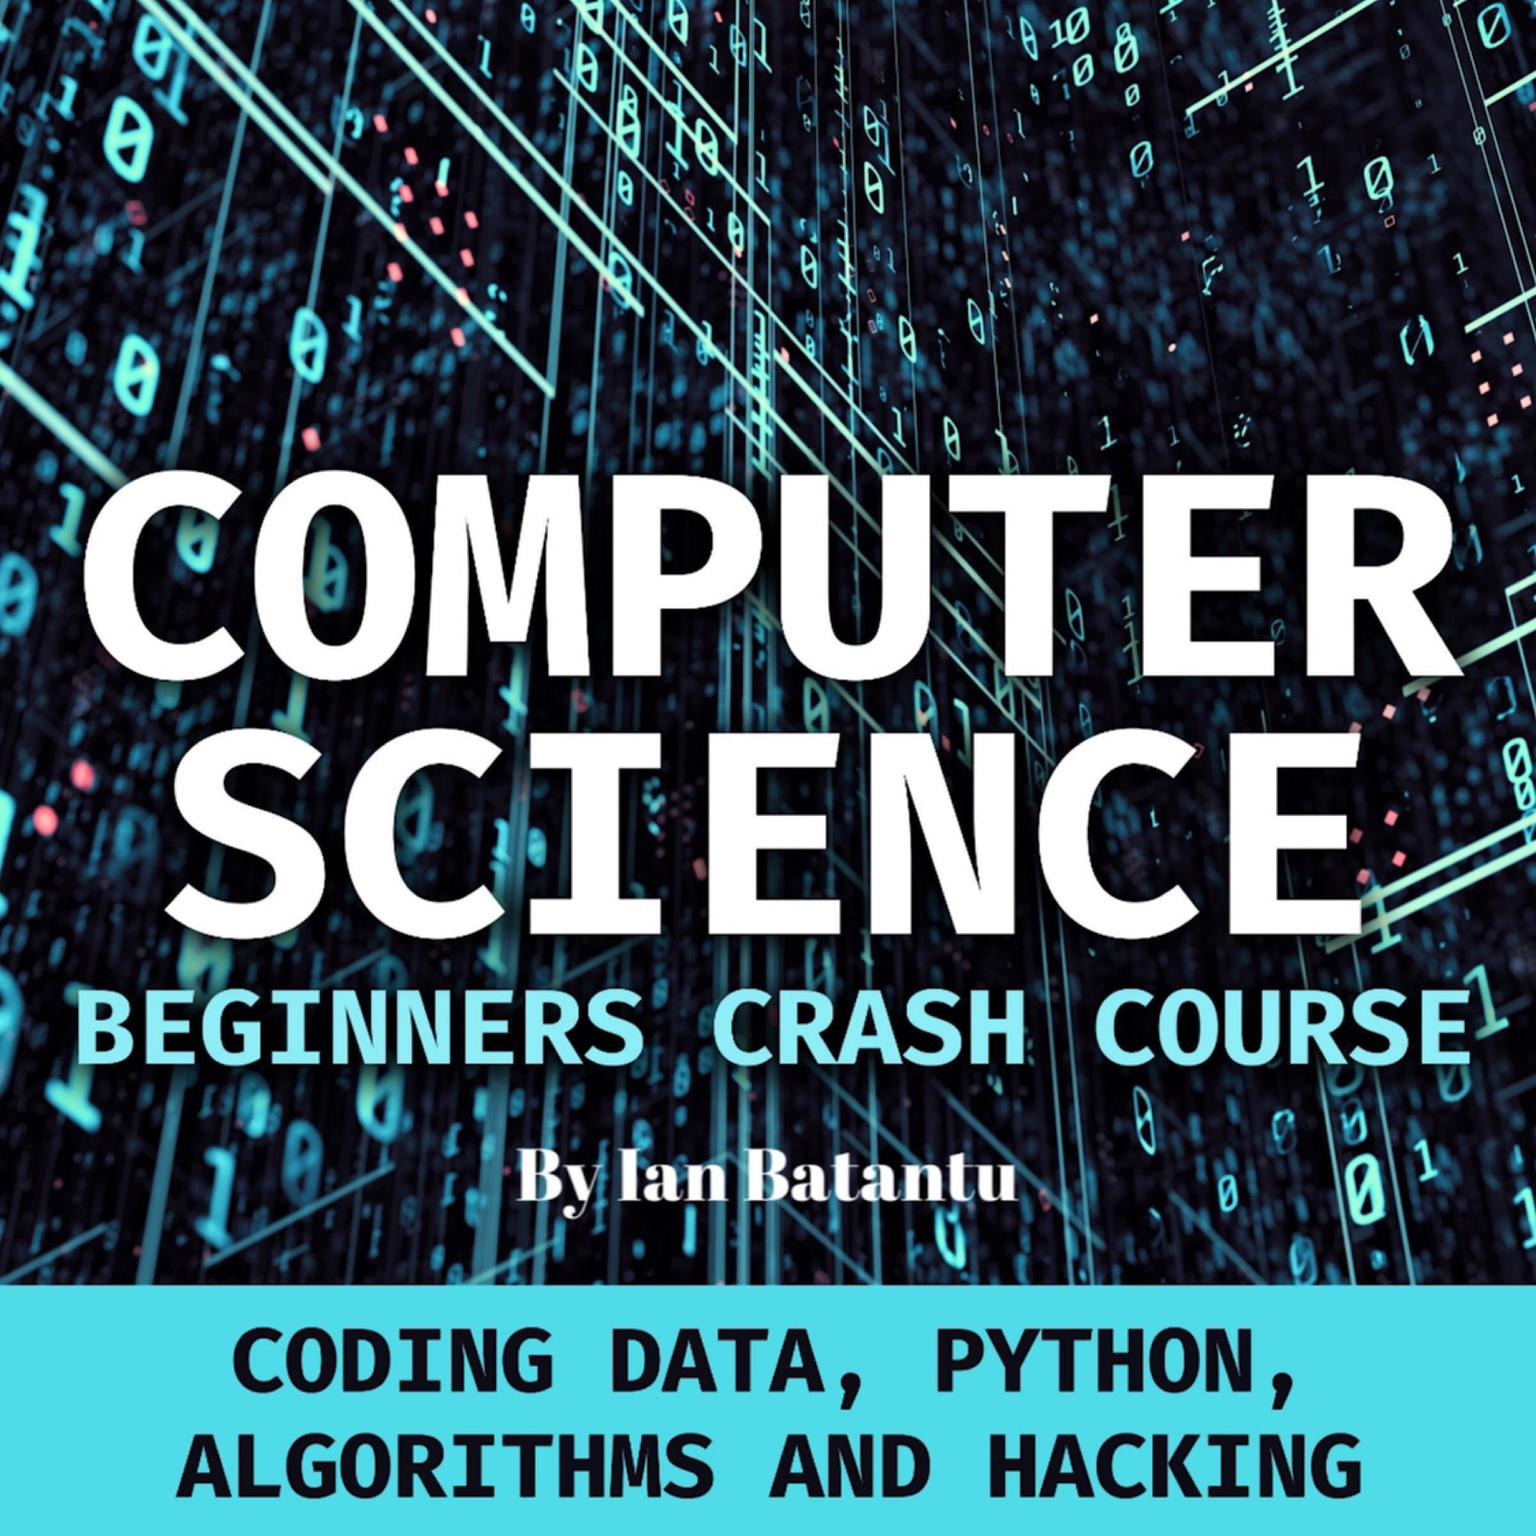 Computer Science Beginners Crash Course: Coding Data, Python, Algorithms & Hacking Audiobook, by Ian Batantu